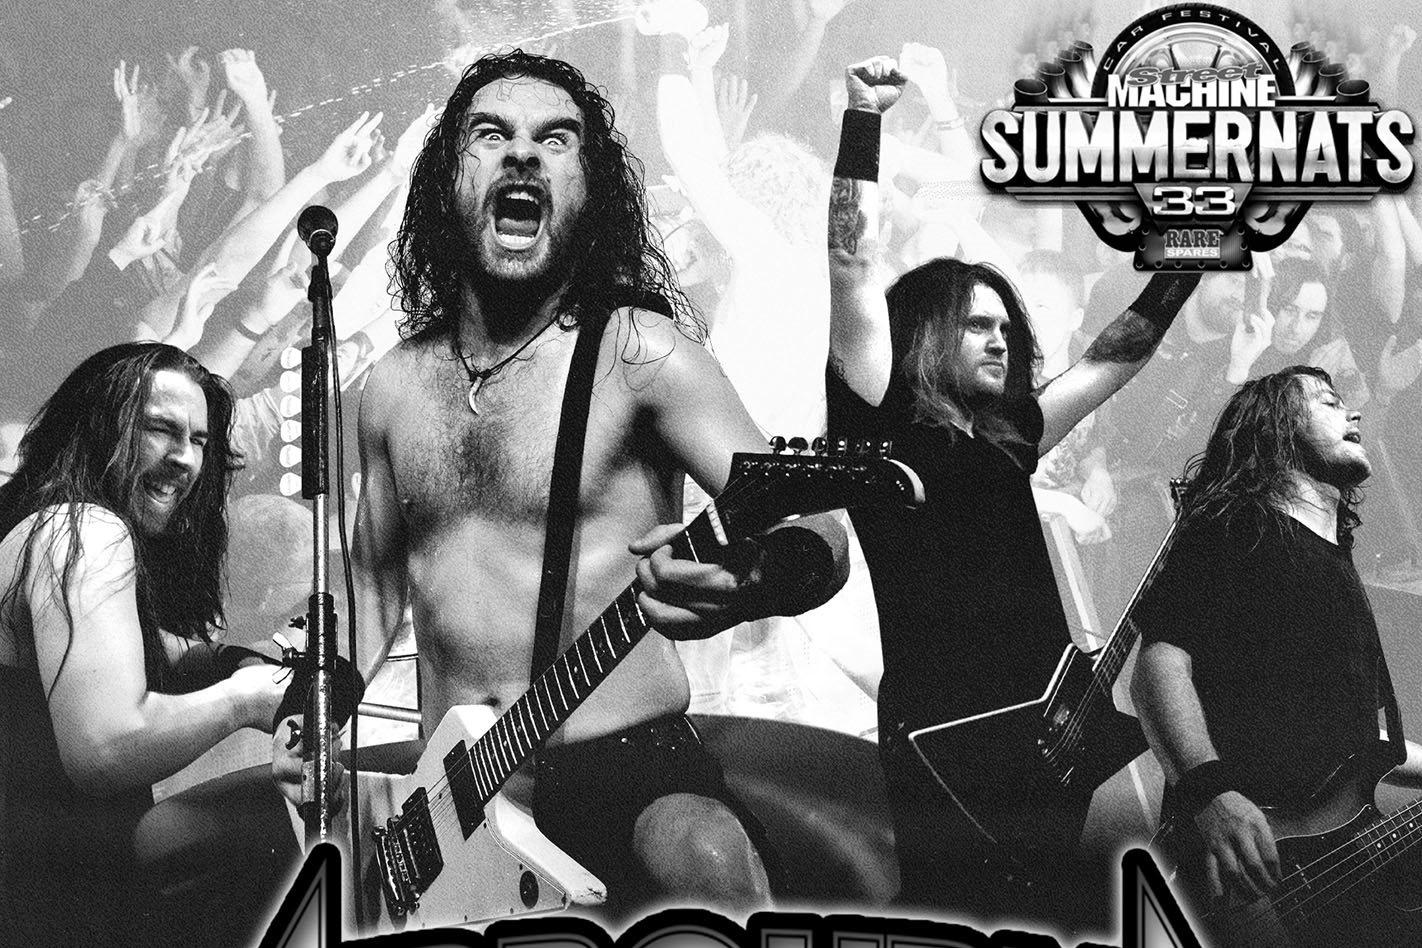 Street Machine Summernats 33 music line-up revealed